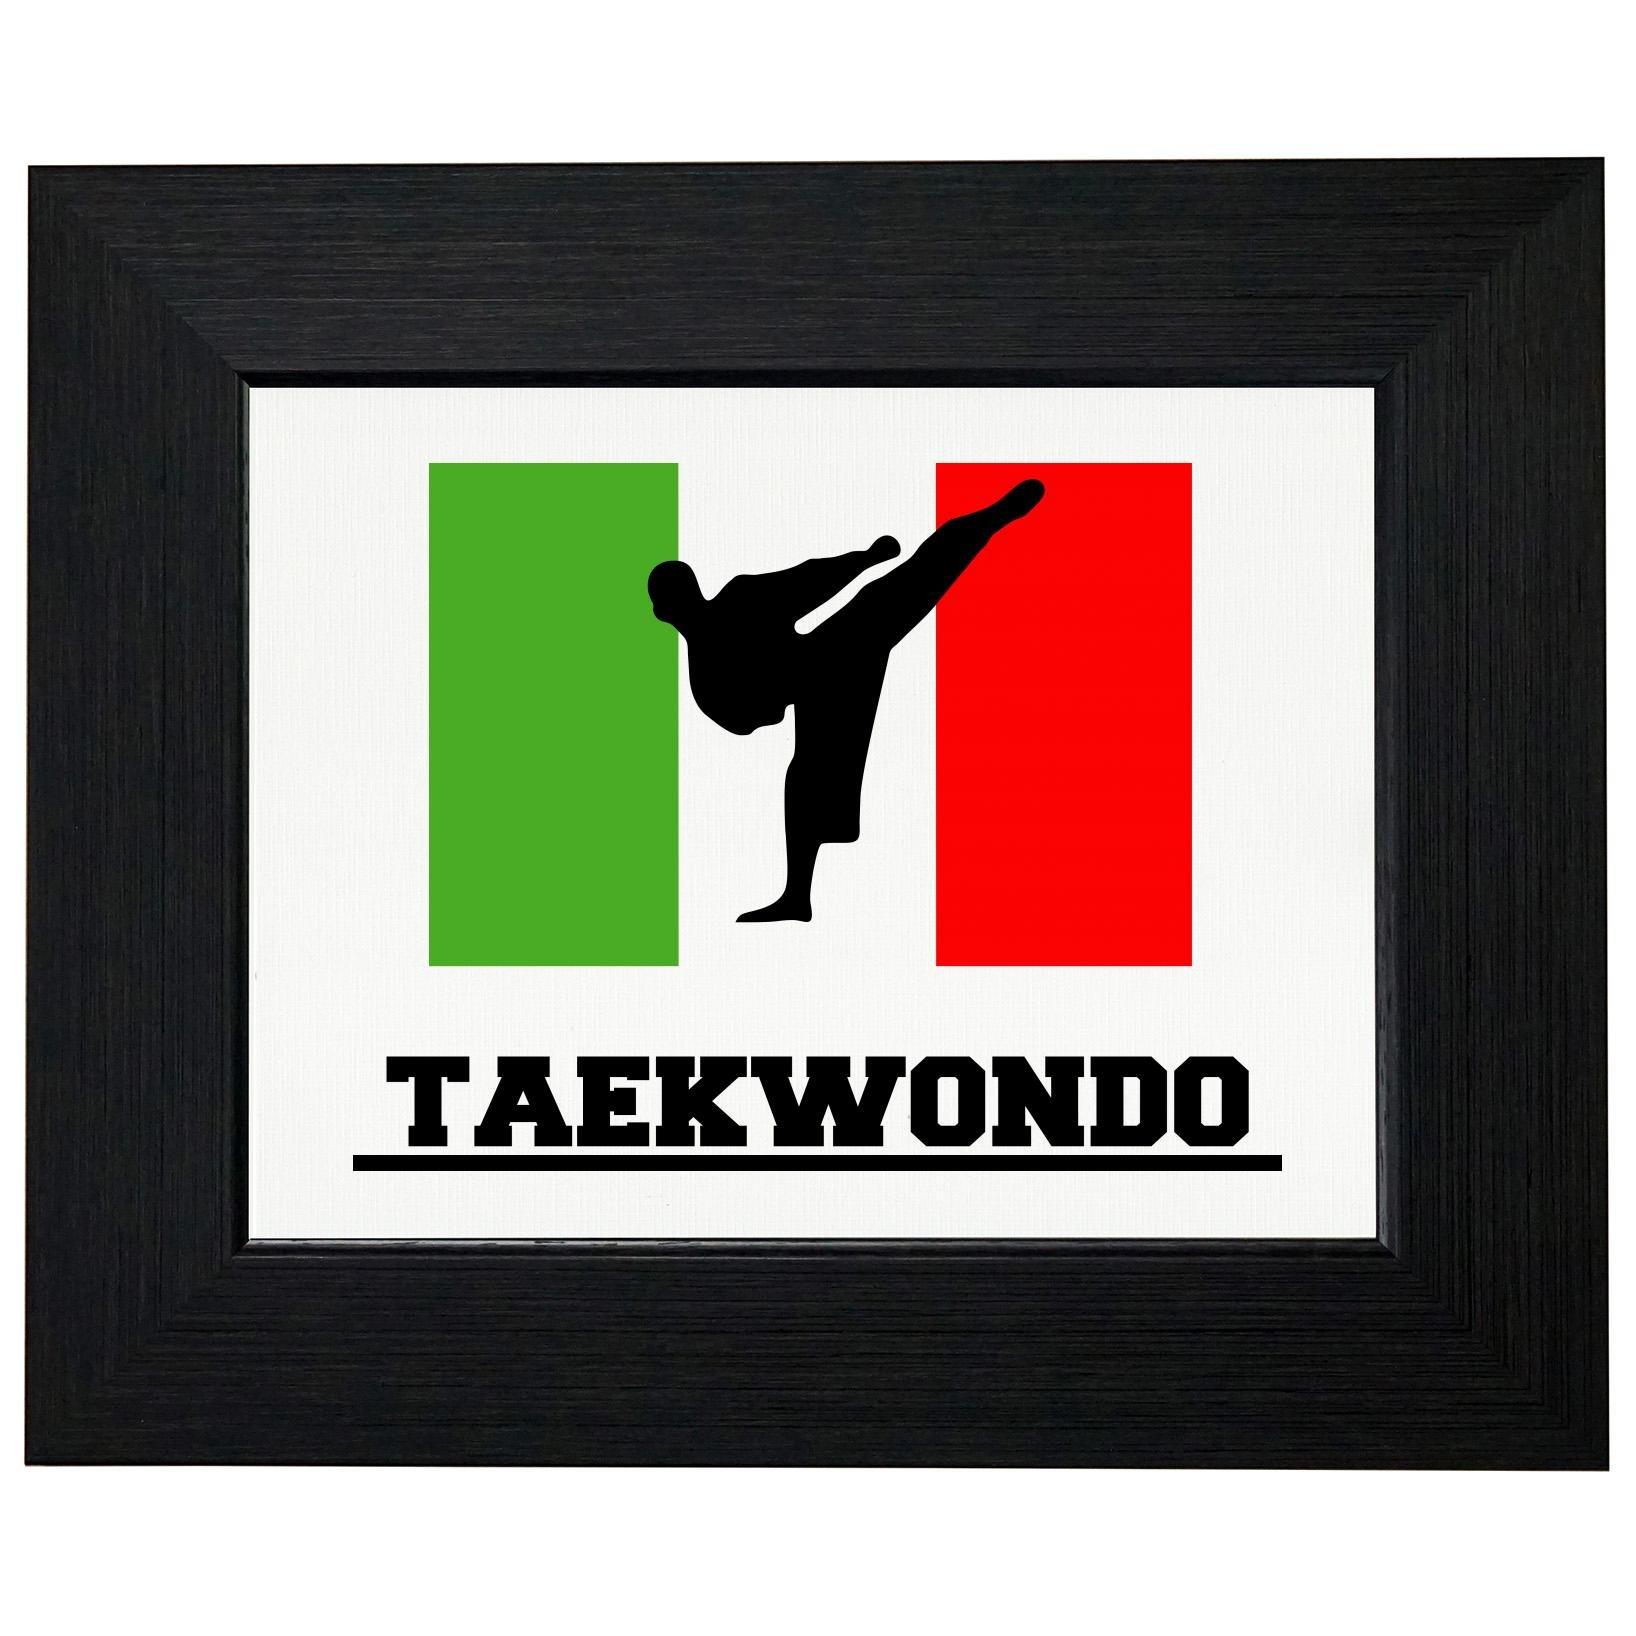 Italy Olympic - Taekwondo - Flag - Silhouette Framed Print Poster Wall or Desk Mount Options